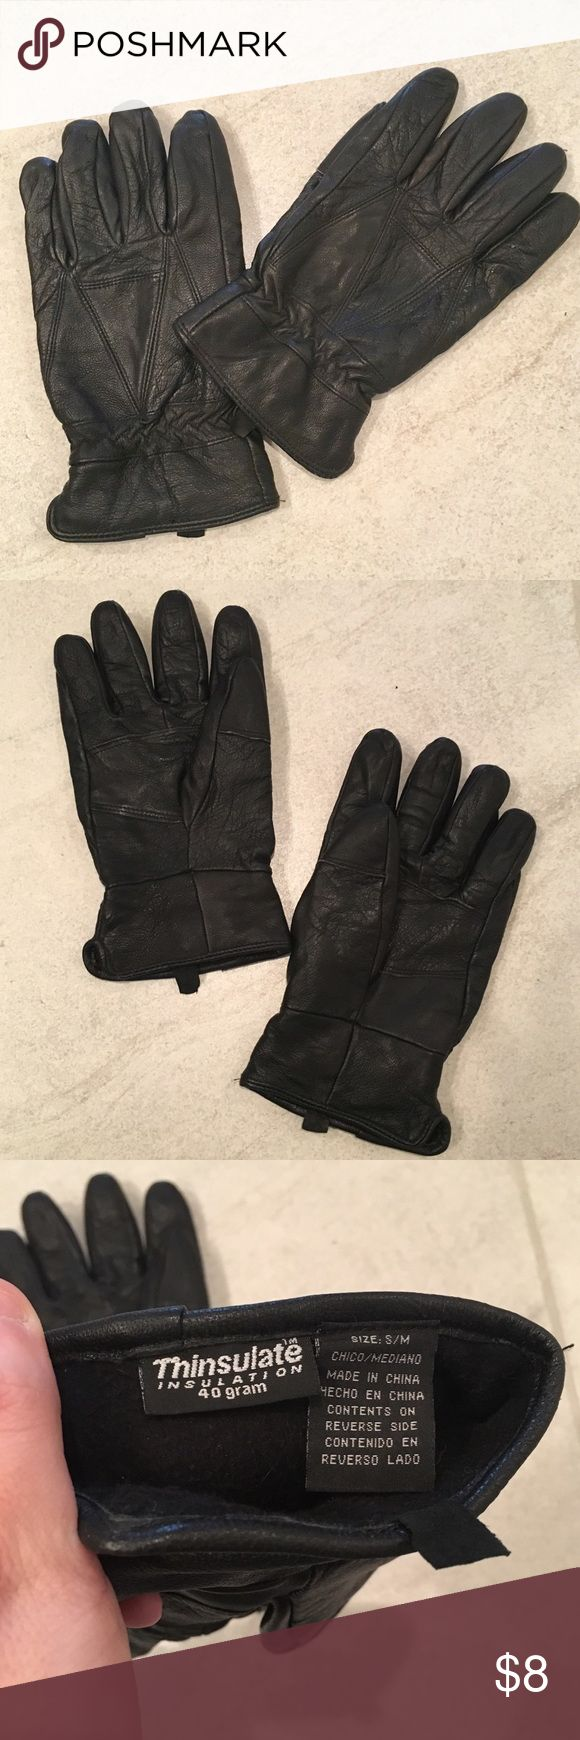 Sheep Skin Thinsulate Gloves Black, sheep skin thinsulate gloves. Minimal wear, very warm. Accessories Gloves